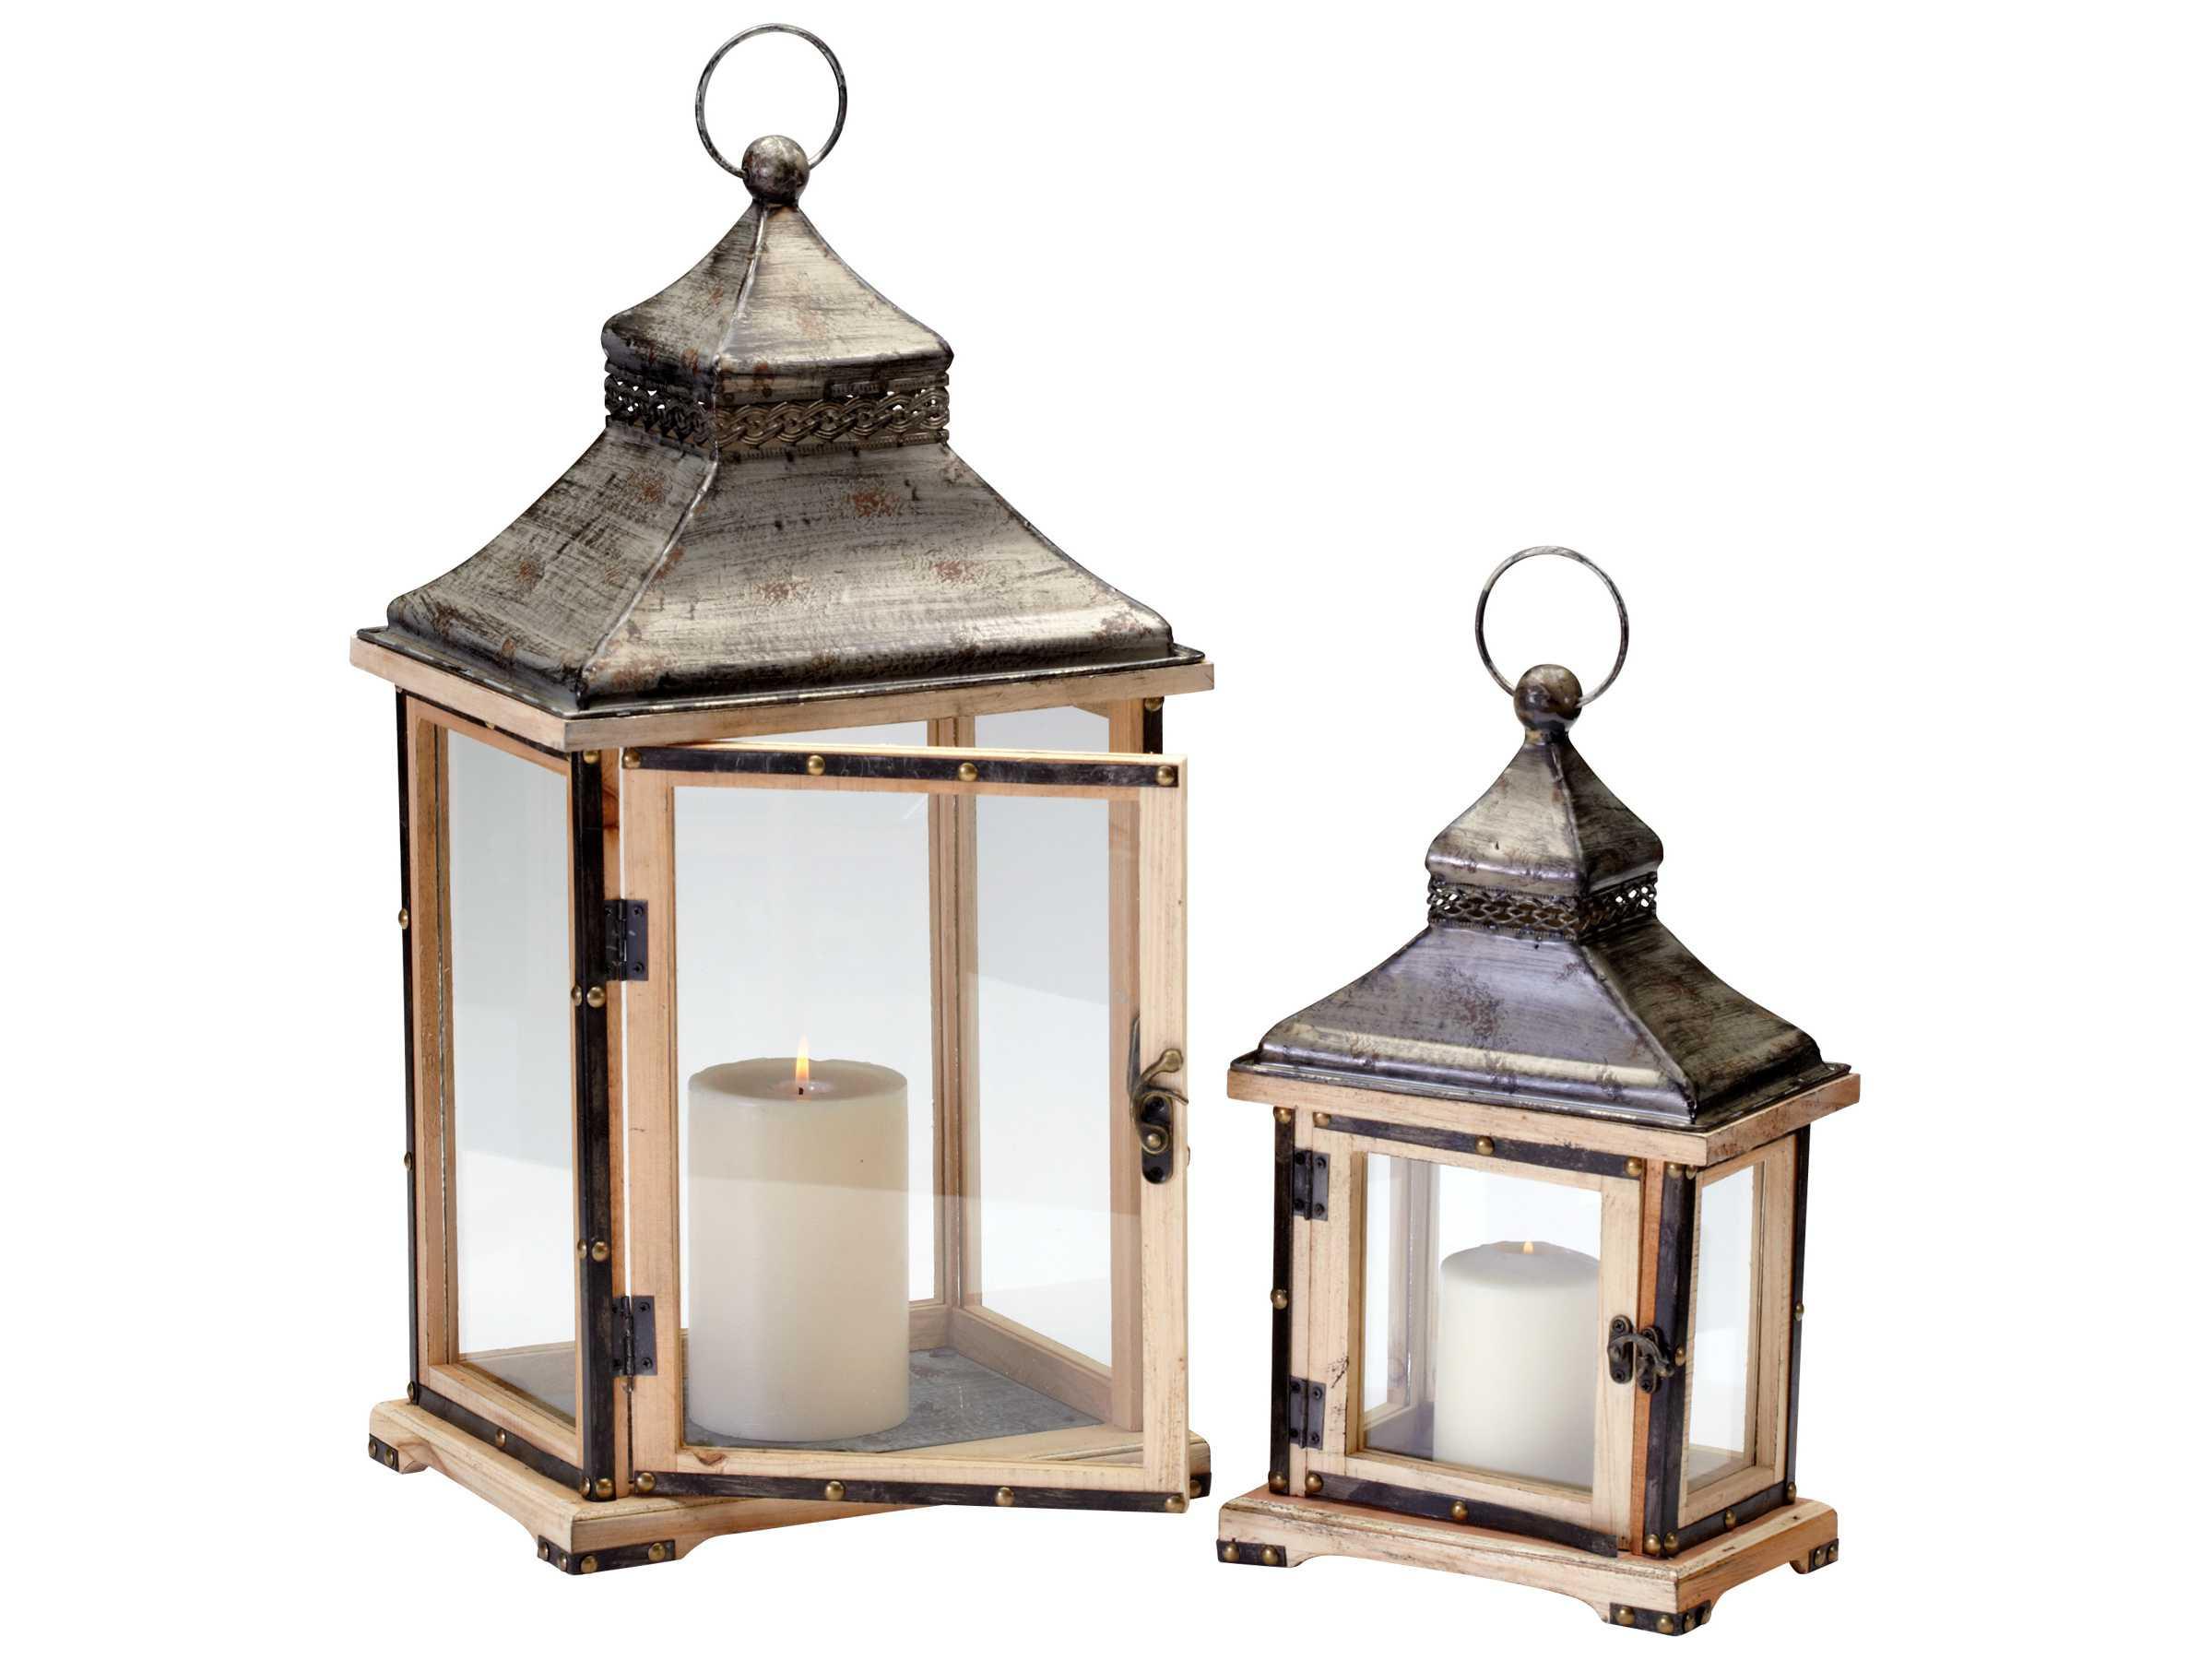 Cyan design oxford raw iron natural wood candle holder for Oxford turned wood candle holders